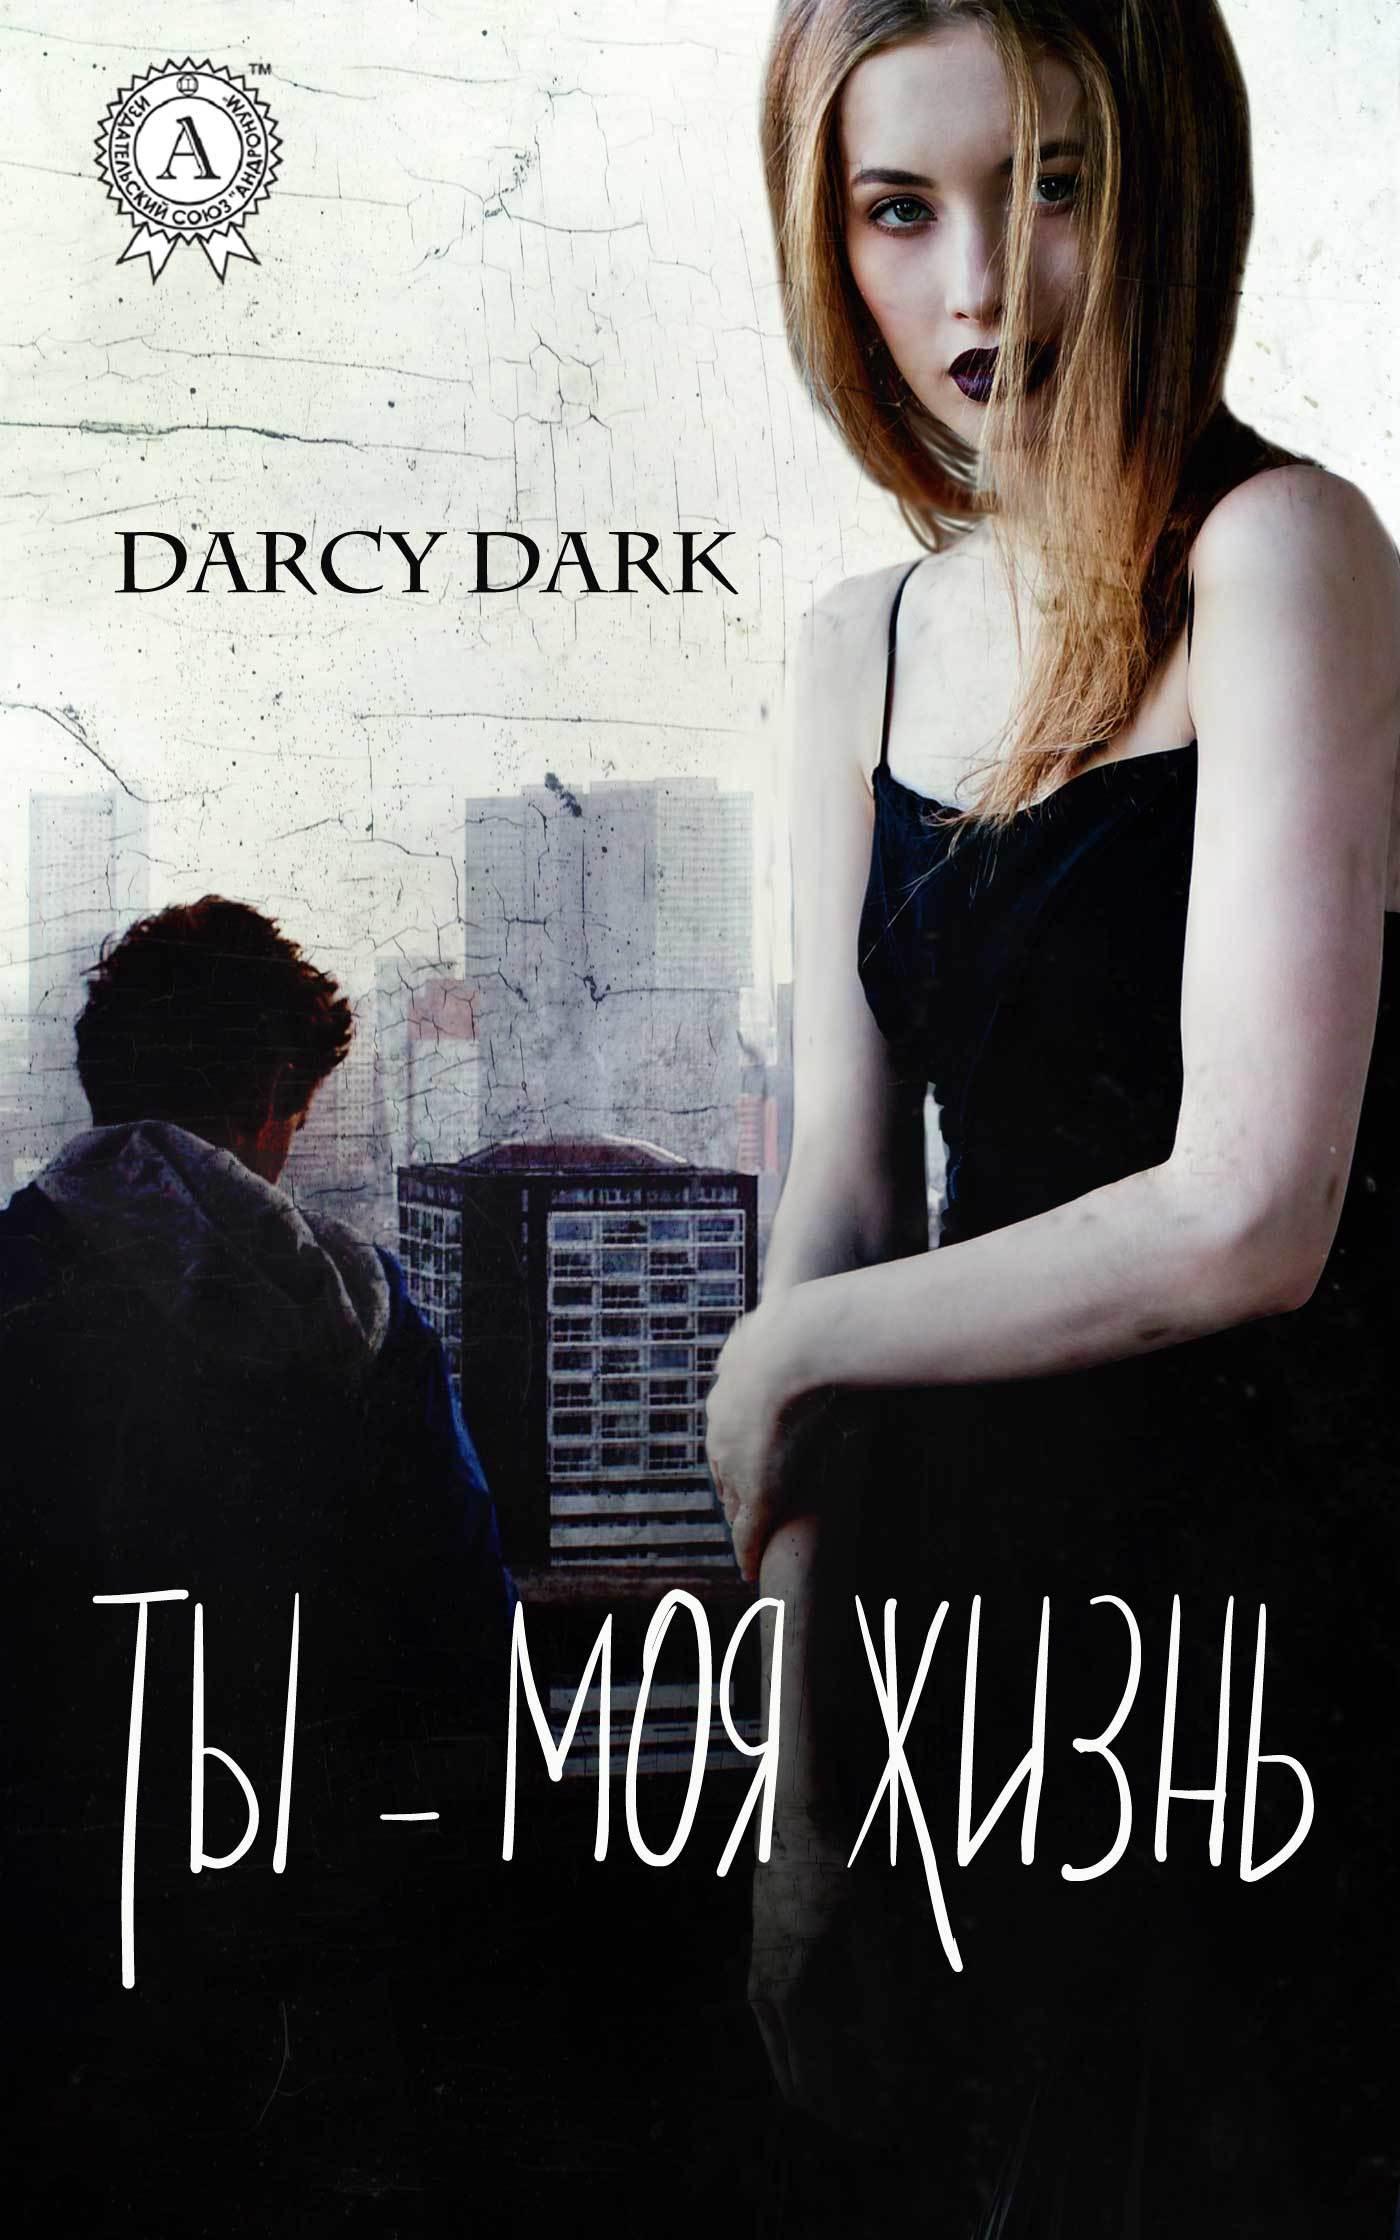 Dark Darcy